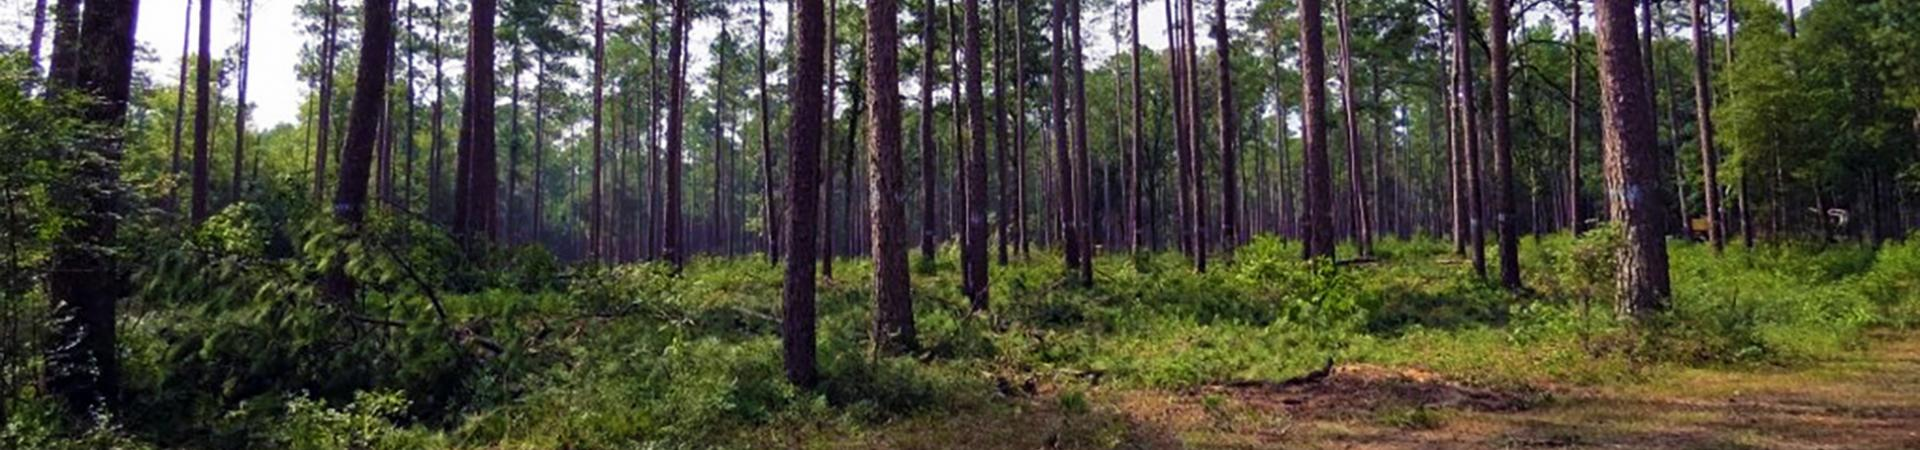 moody forest wma moody forest wma   wildlife resources division  rh   georgiawildlife